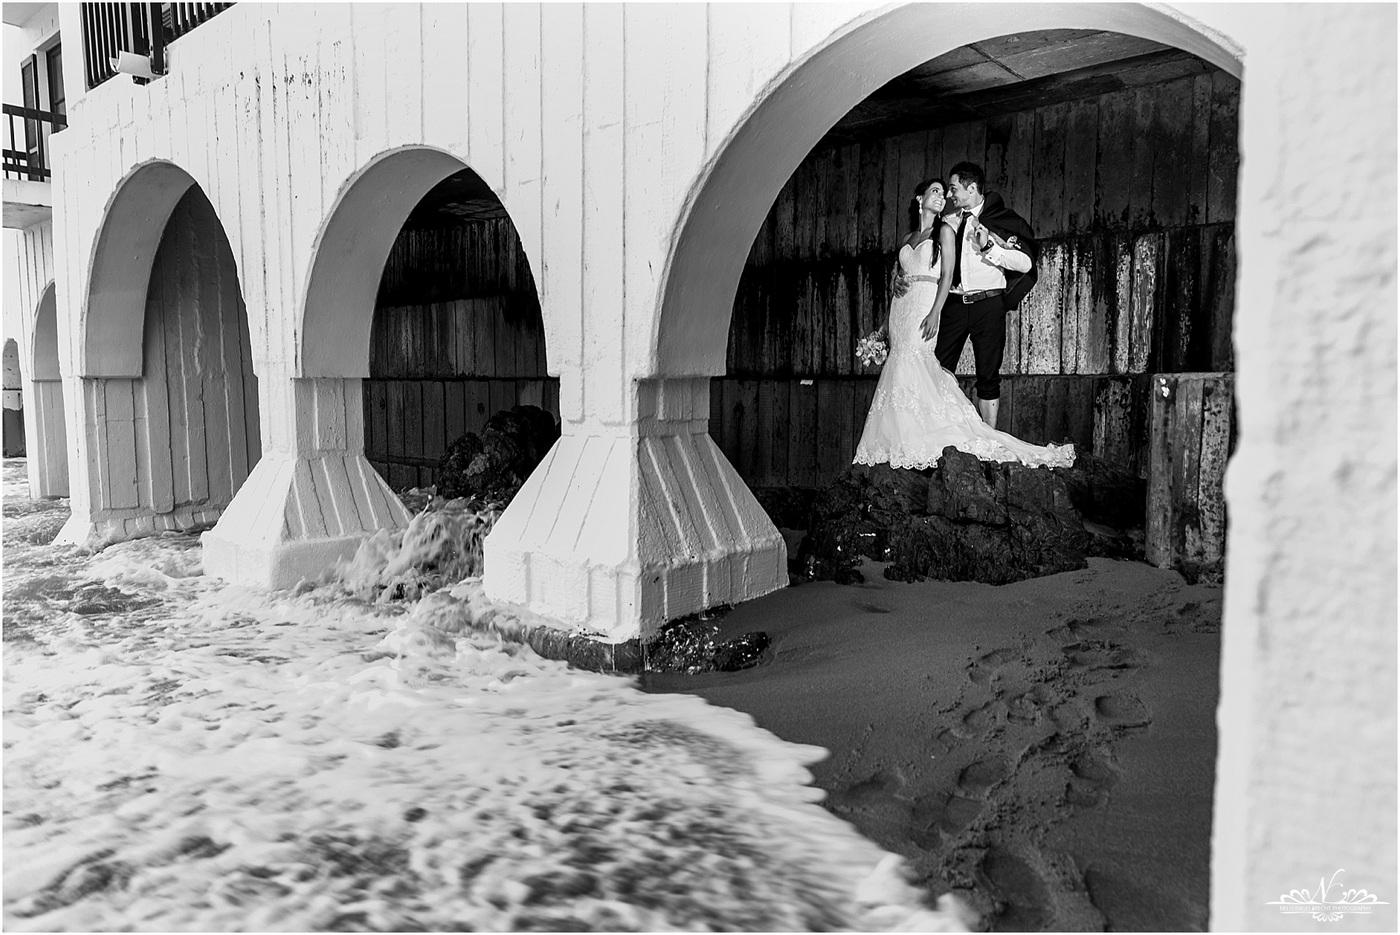 Nelis-Engelbrecht-Photography-1293